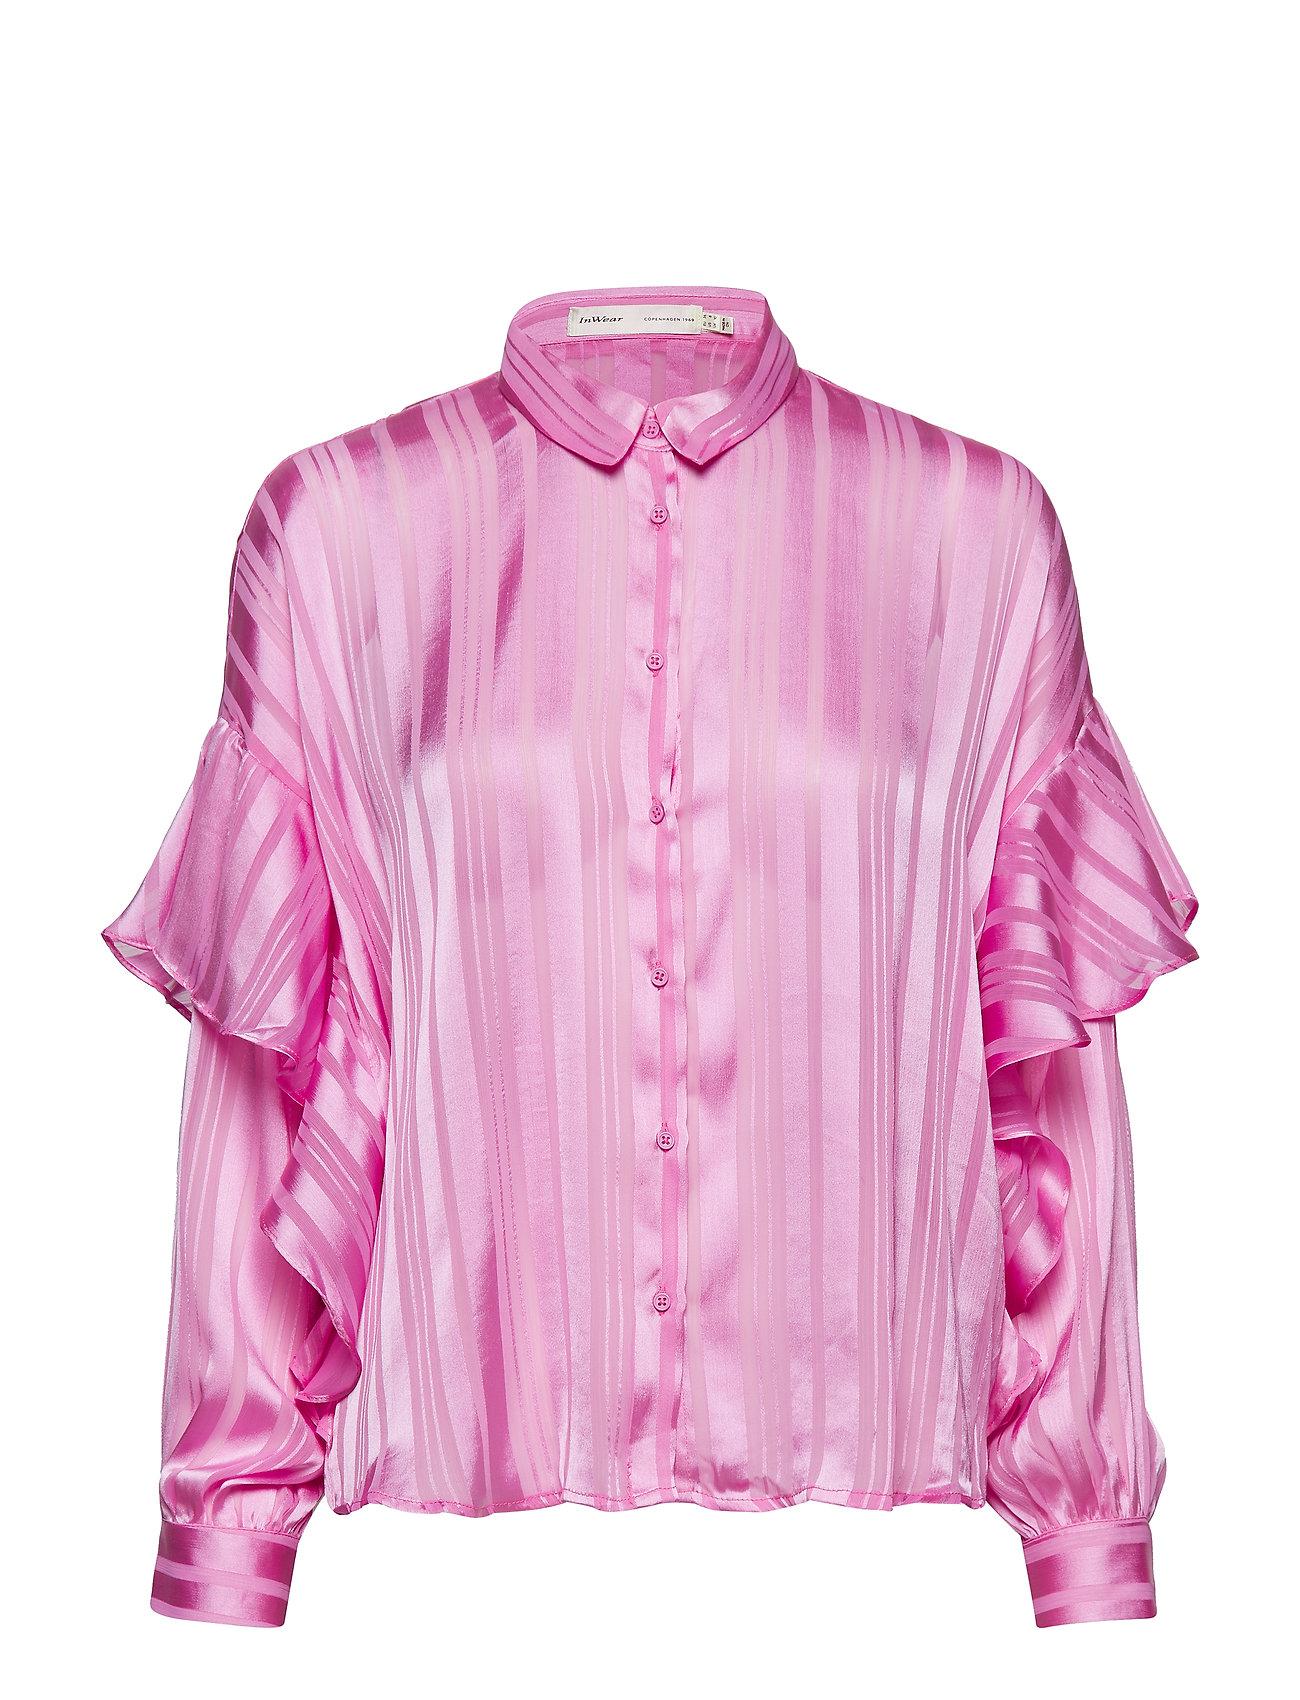 InWear Hilma Shirt - DAHLIA PINK